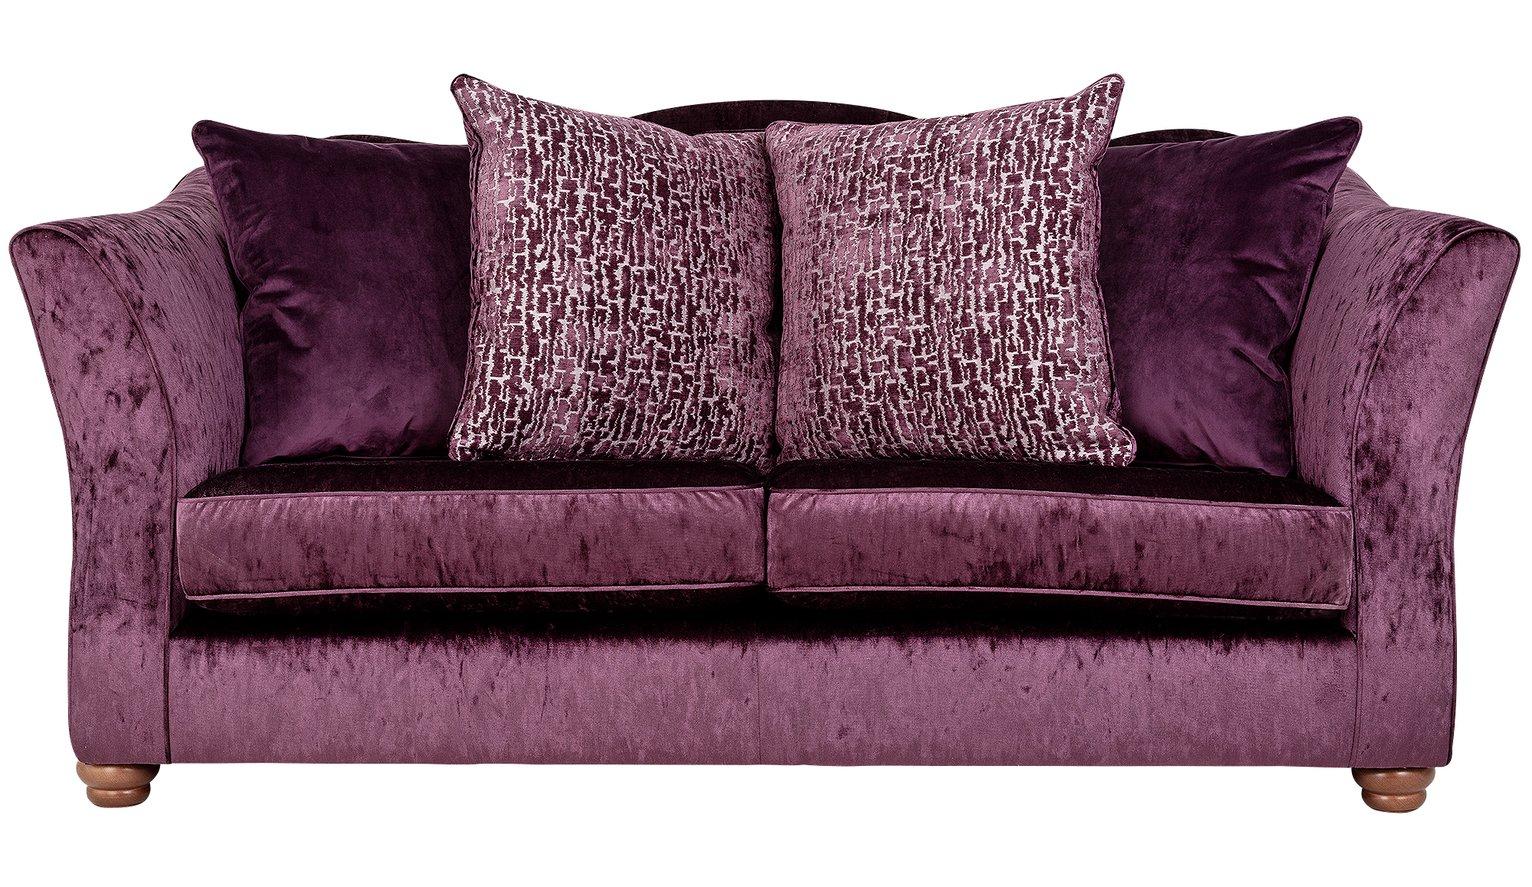 Argos Home Fantasia 3 Seater Velvet Sofa - Purple